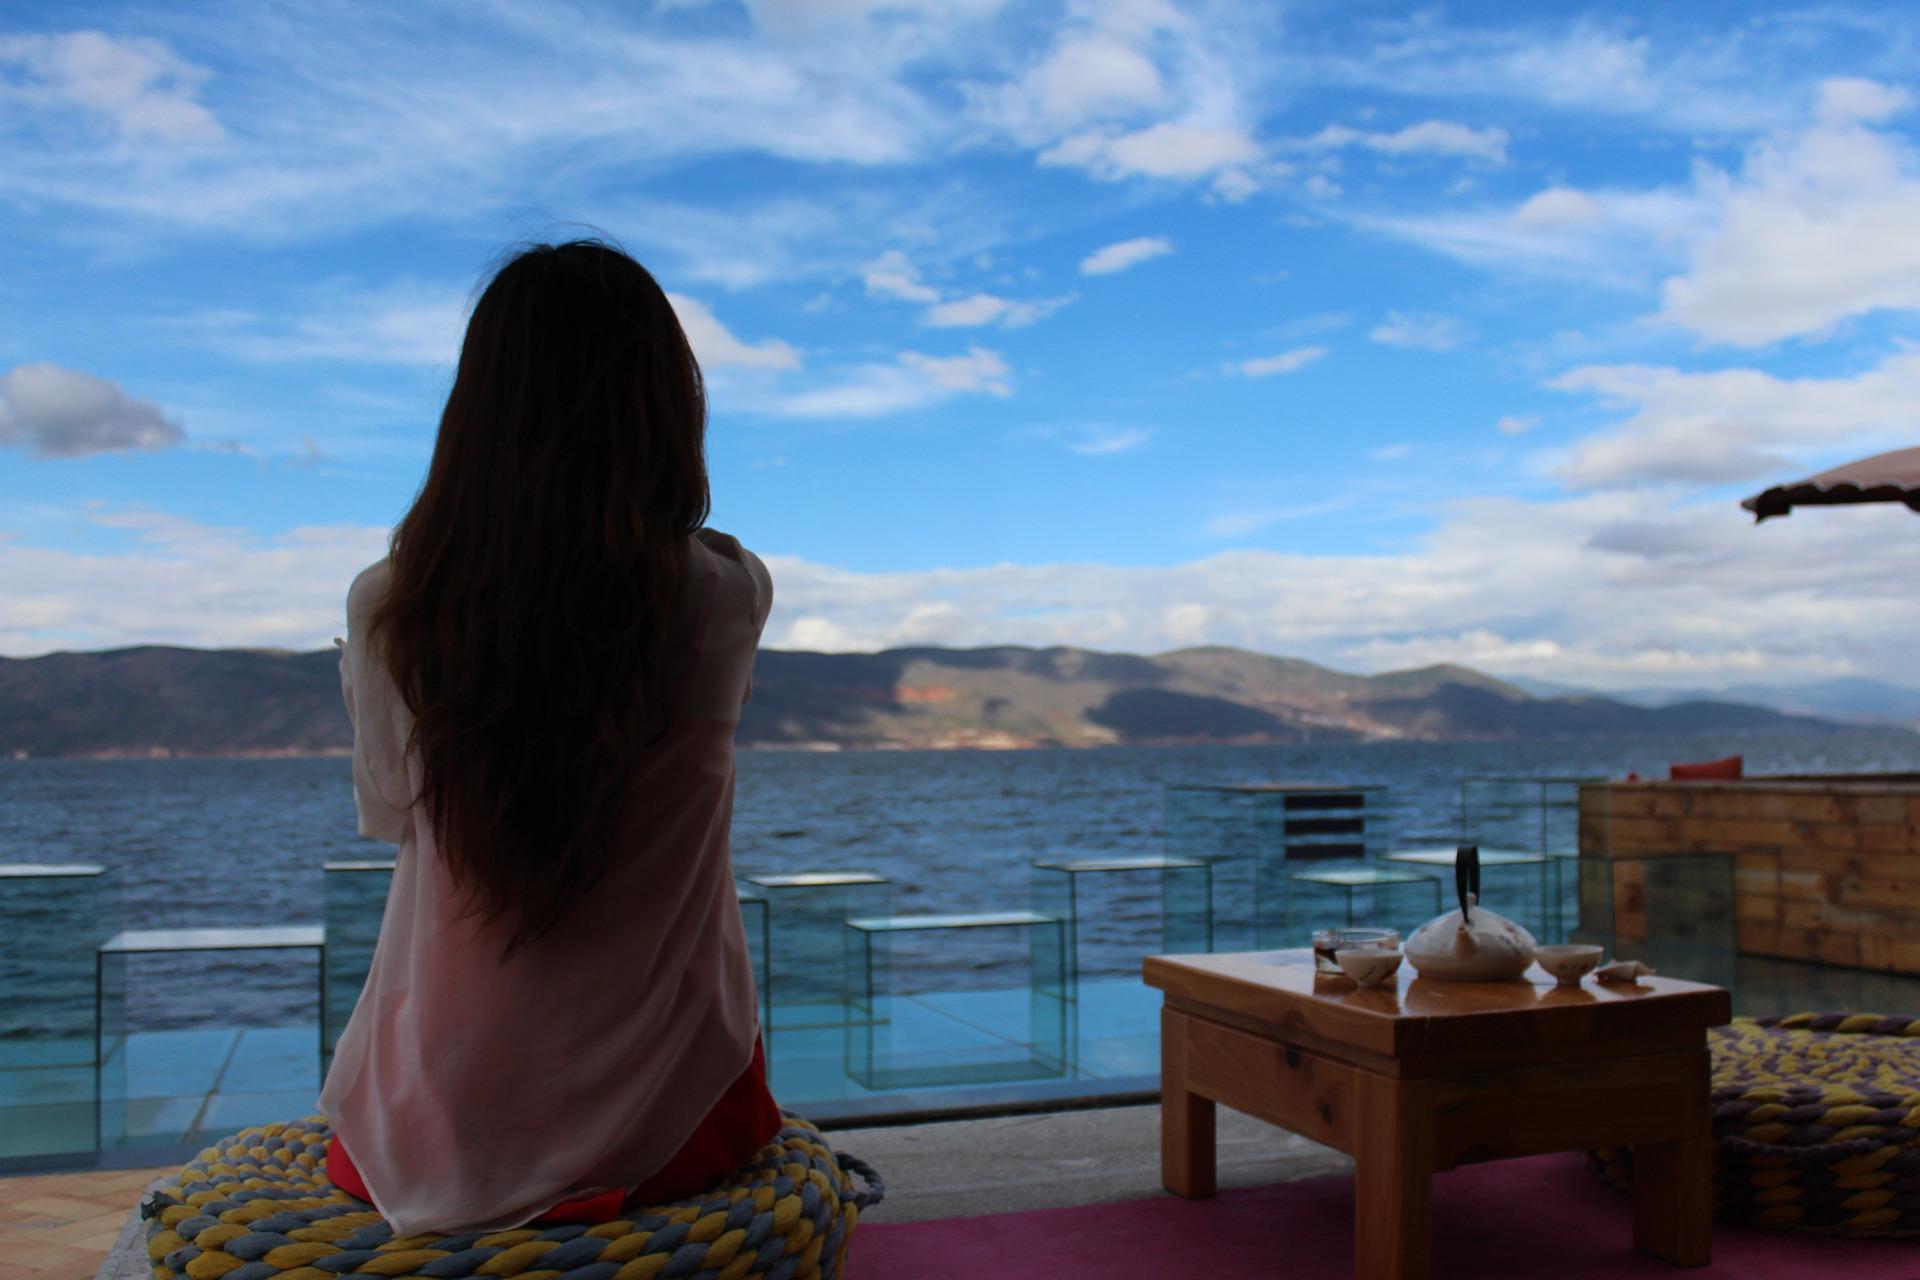 meditating girl, meditation, thinking